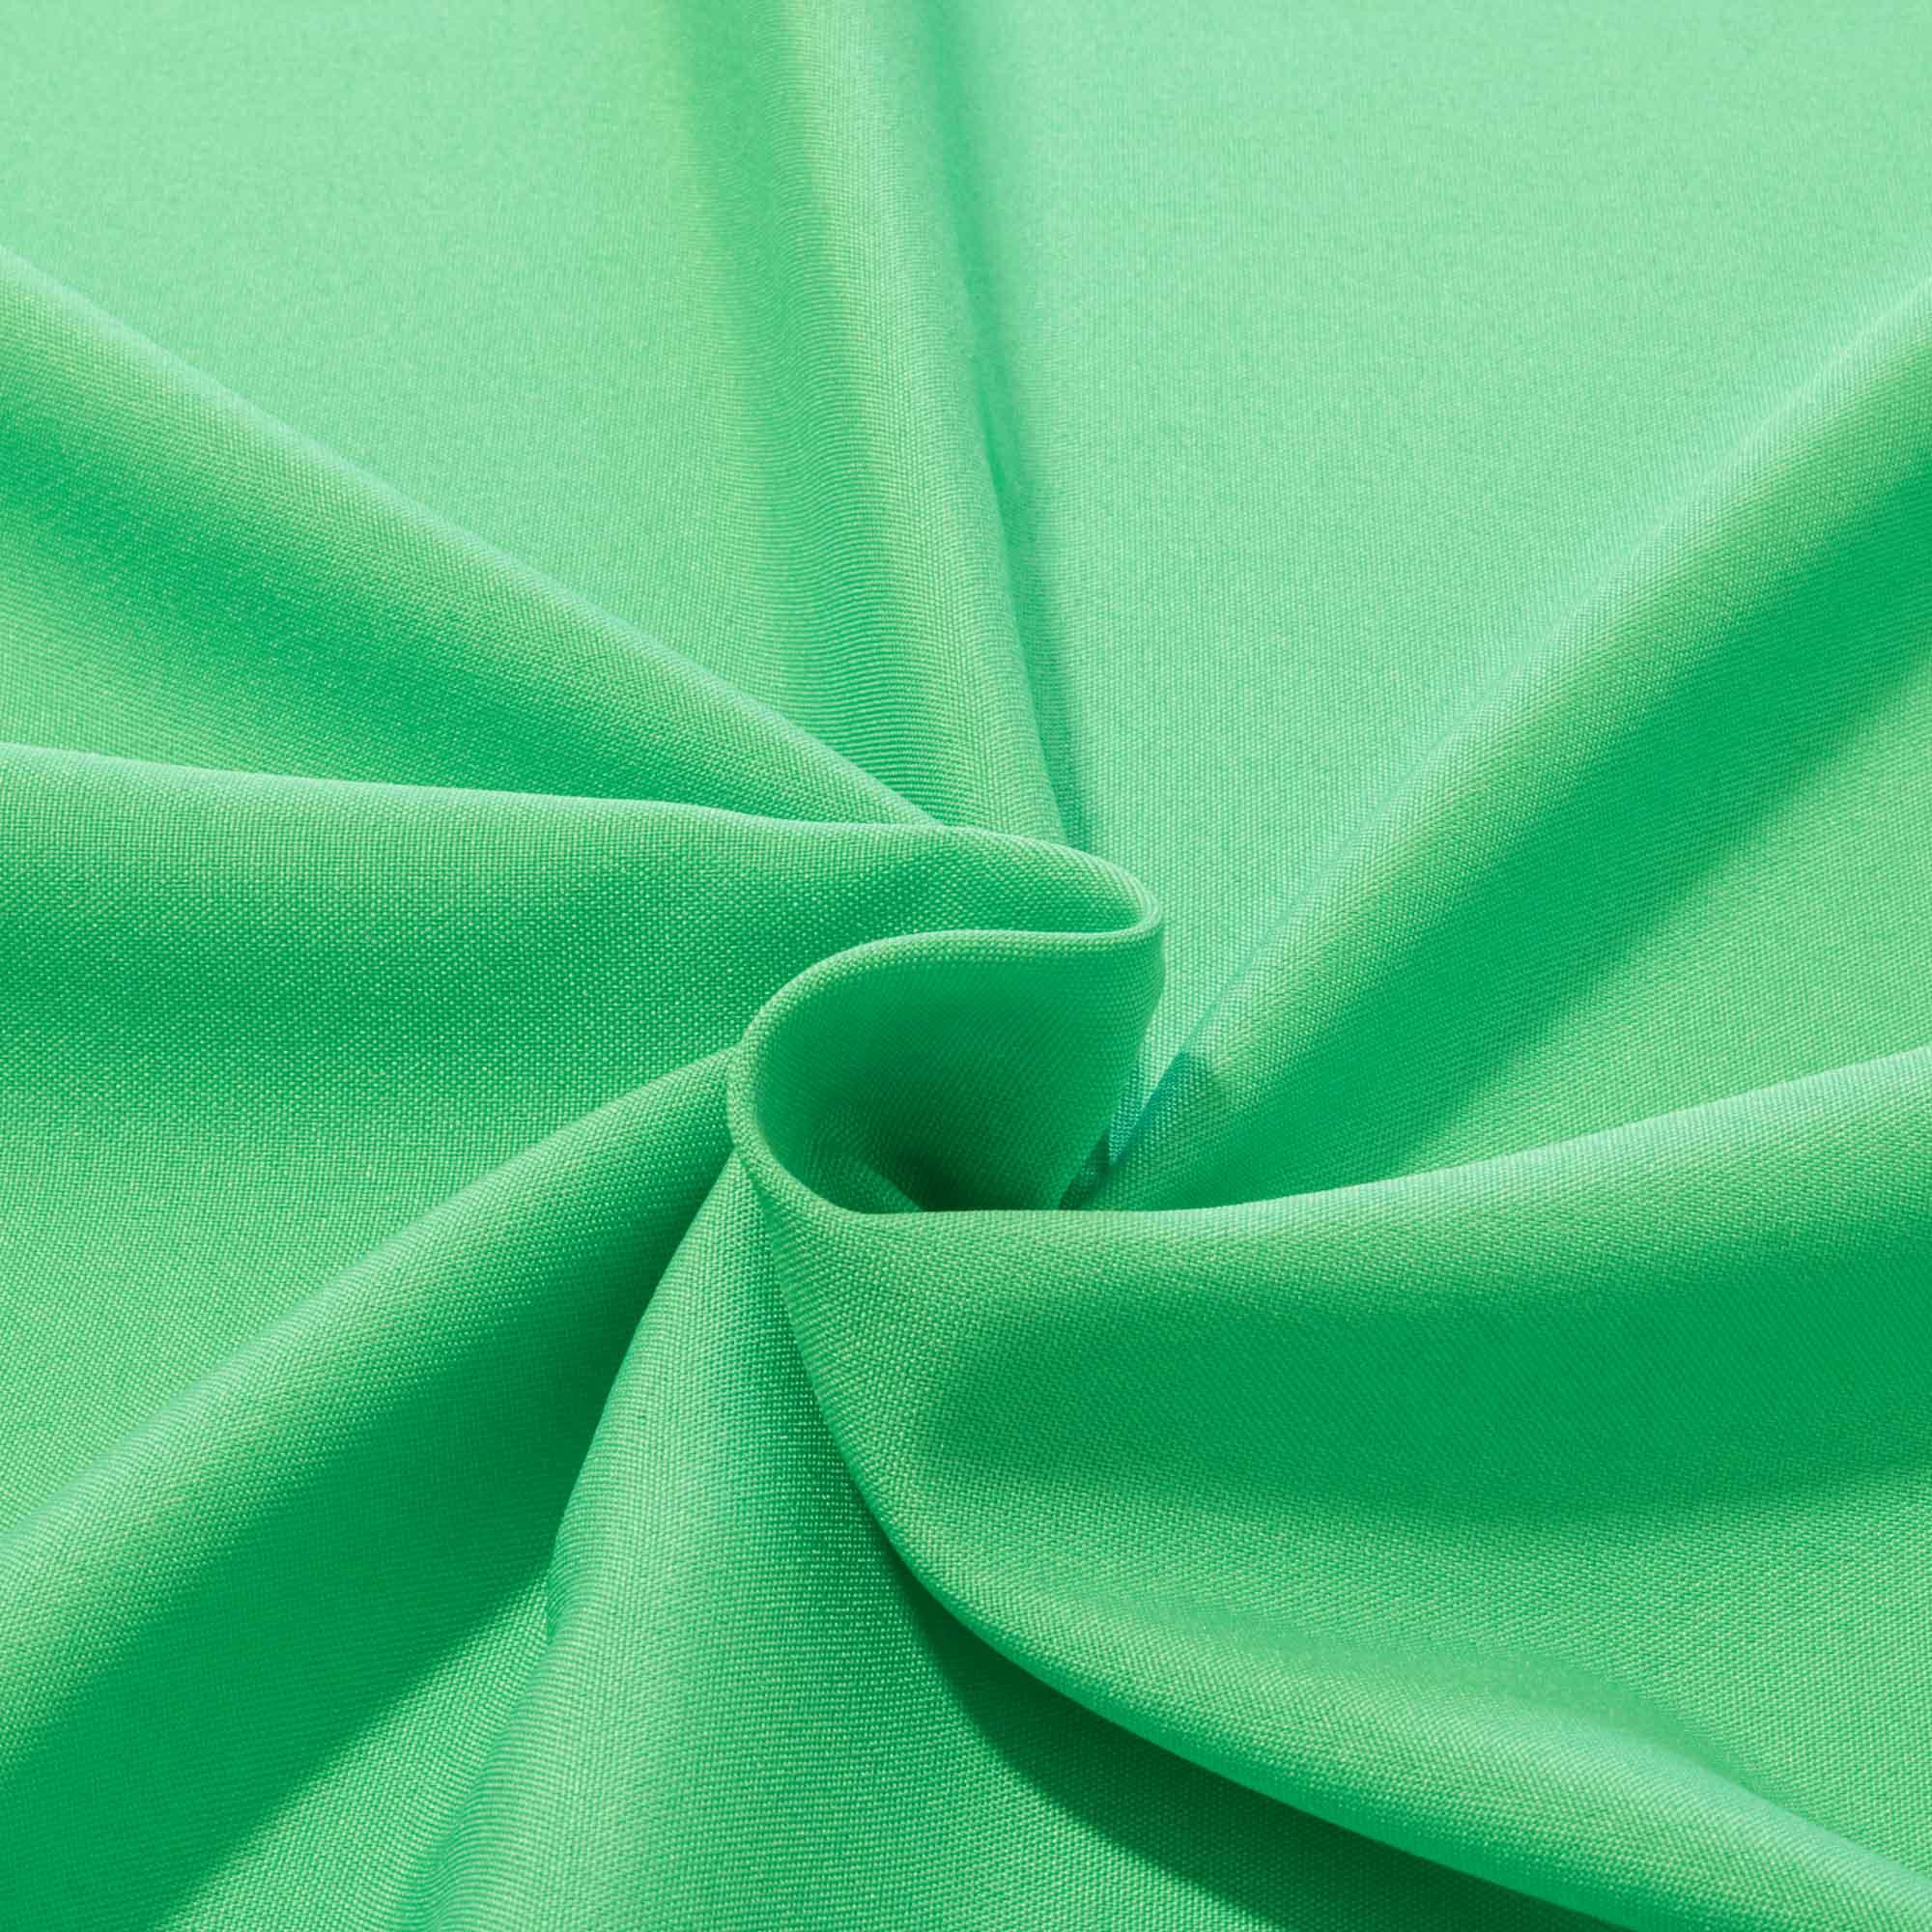 Tecido Oxford Liso 100% Poliester 1,50 m Largura Verde Tiffany